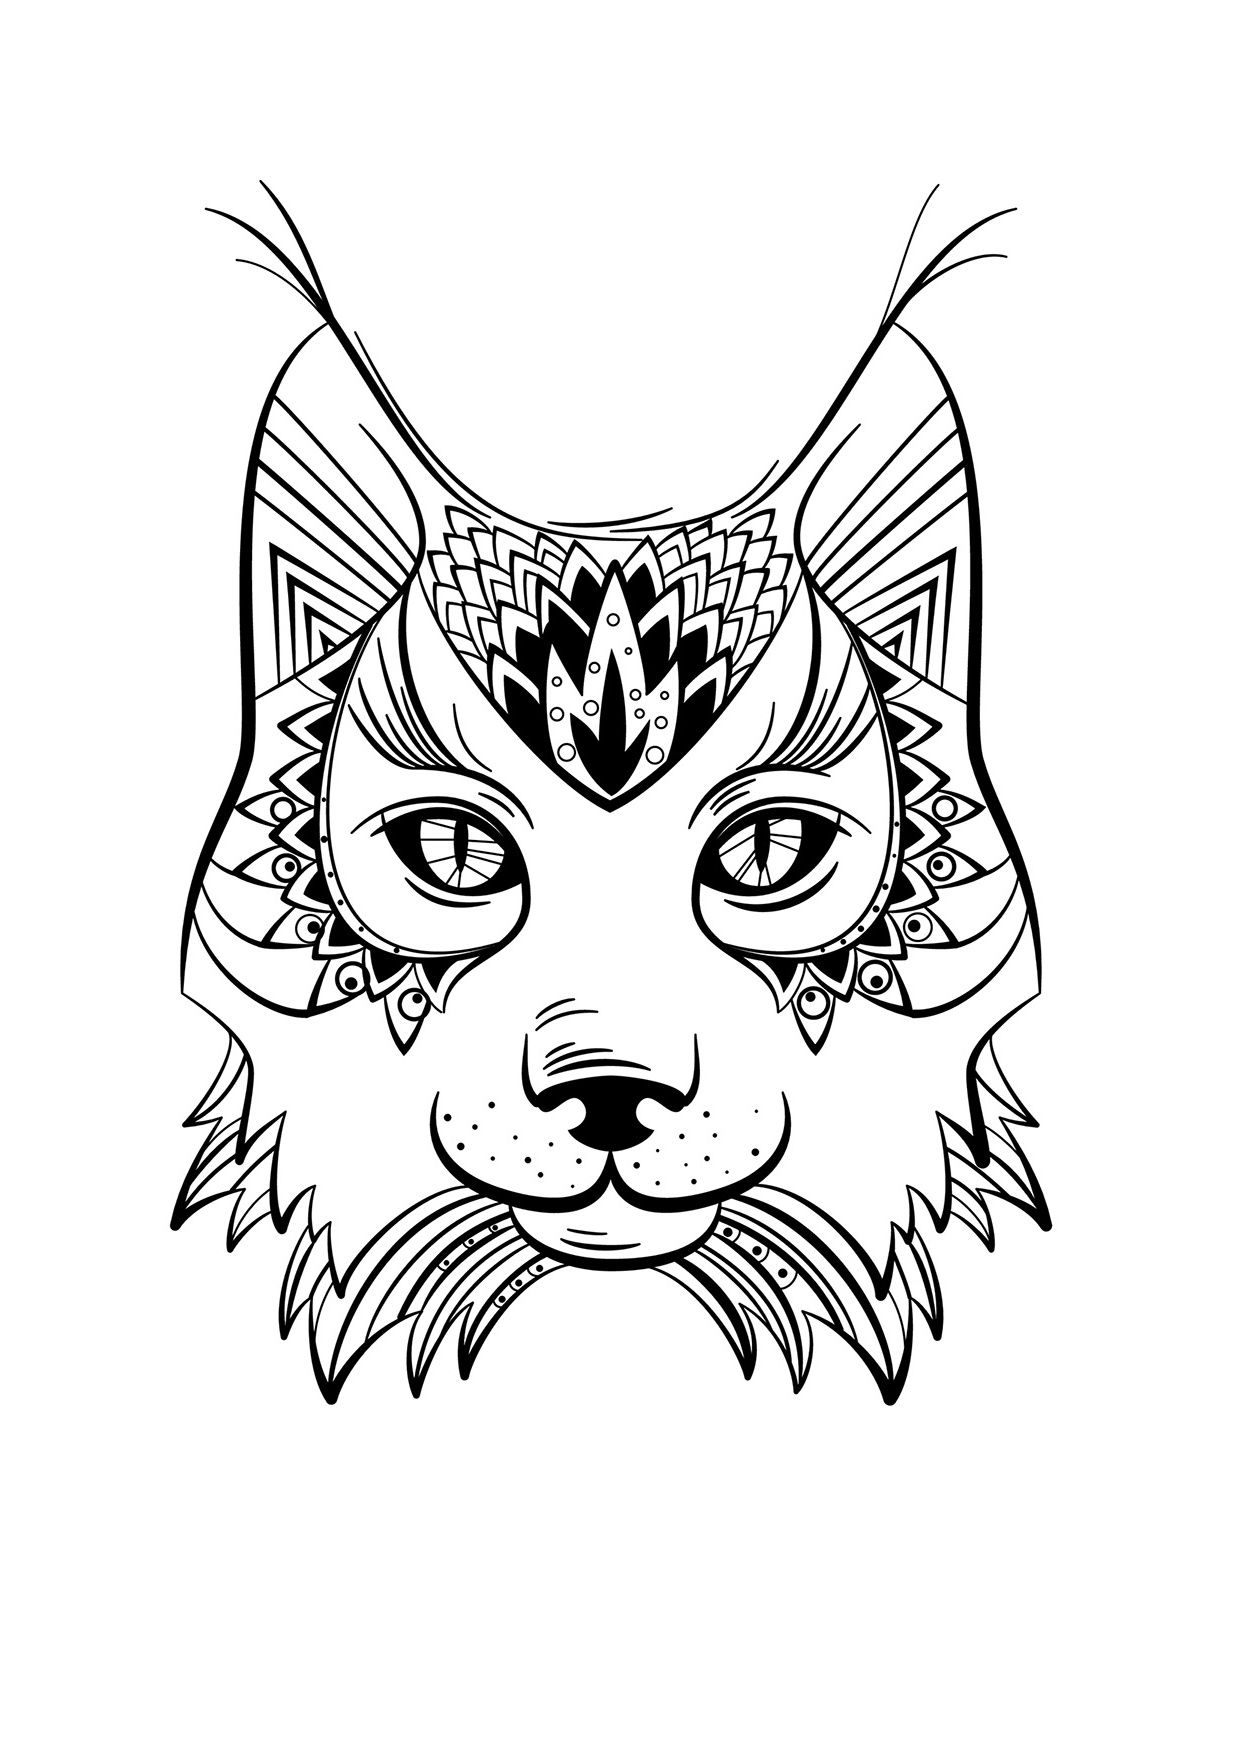 19 Clip Art Wolf etc ideas in 19  wolf, art, wolf drawing